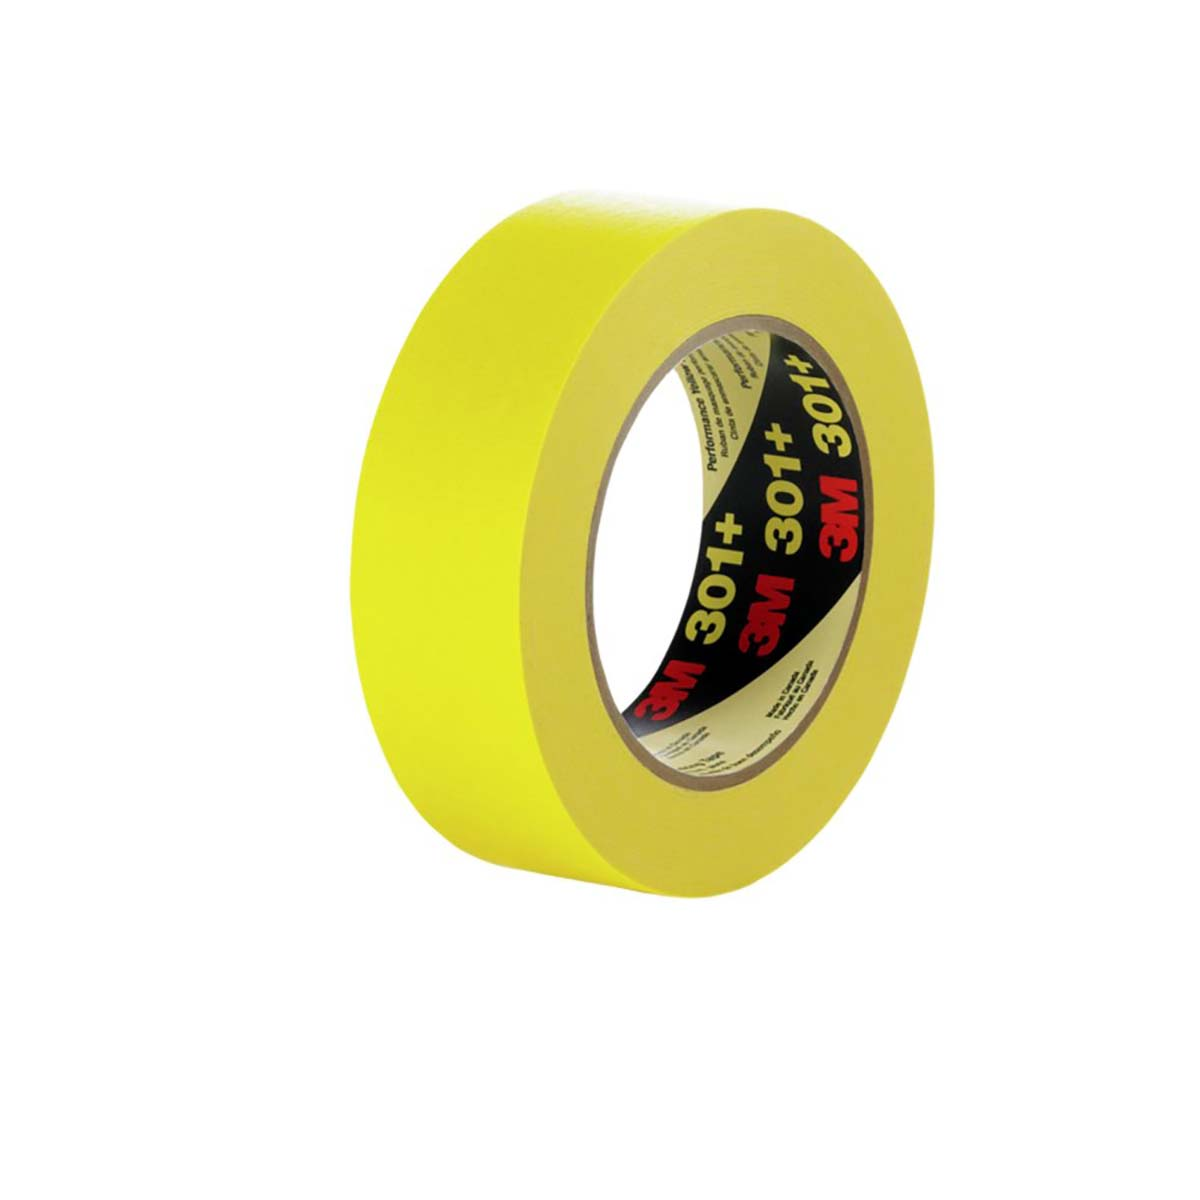 3M Performance Yellow Masking Tape 301+, 48 mm x 55 m 6.3 mil, 24 per case Bulk